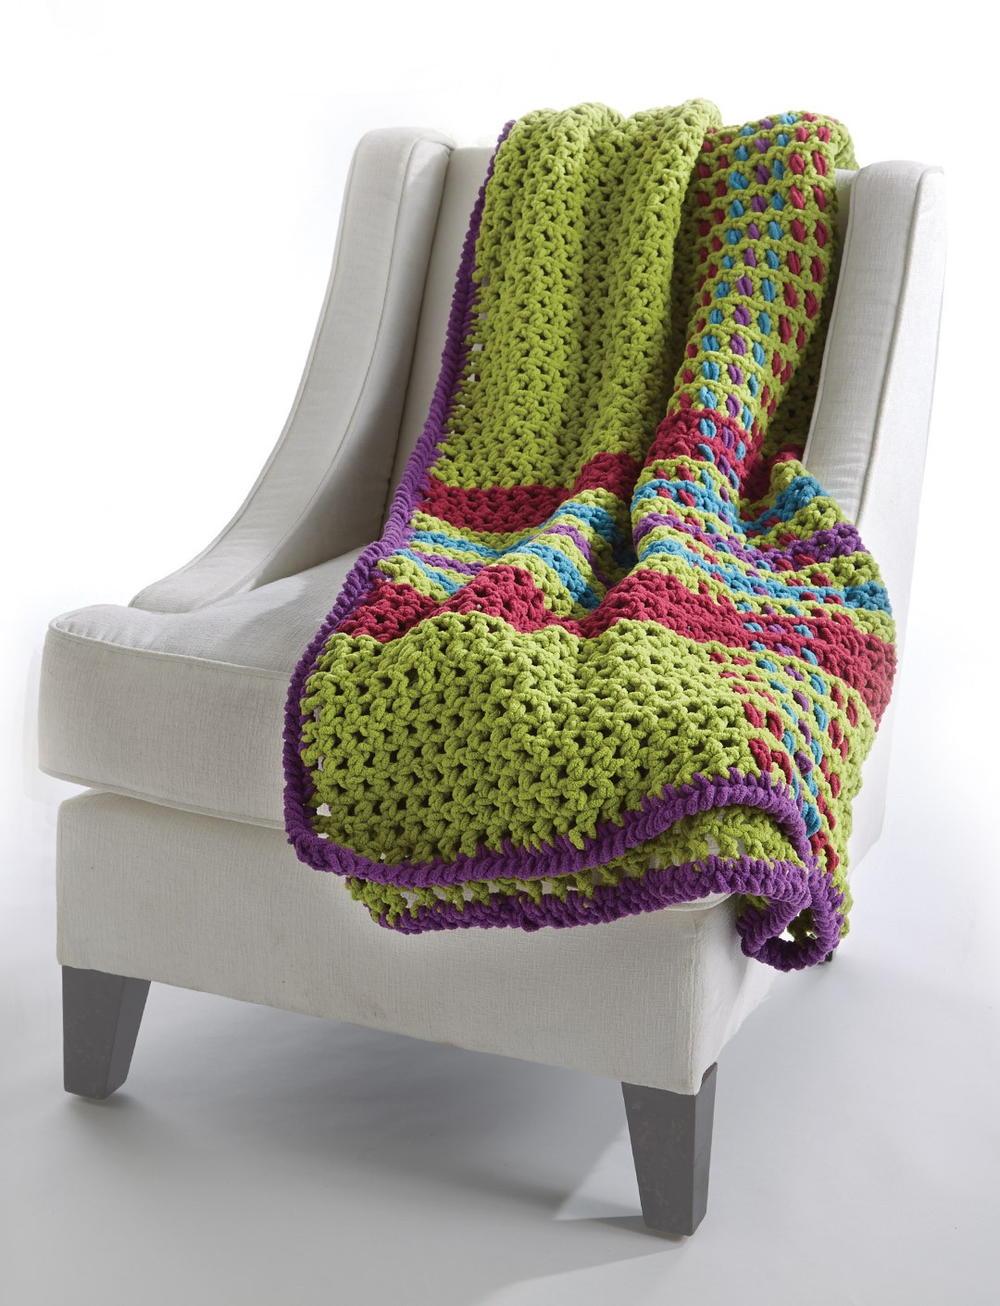 Homey Plaid Crochet Blanket Allfreecrochetafghanpatterns Com